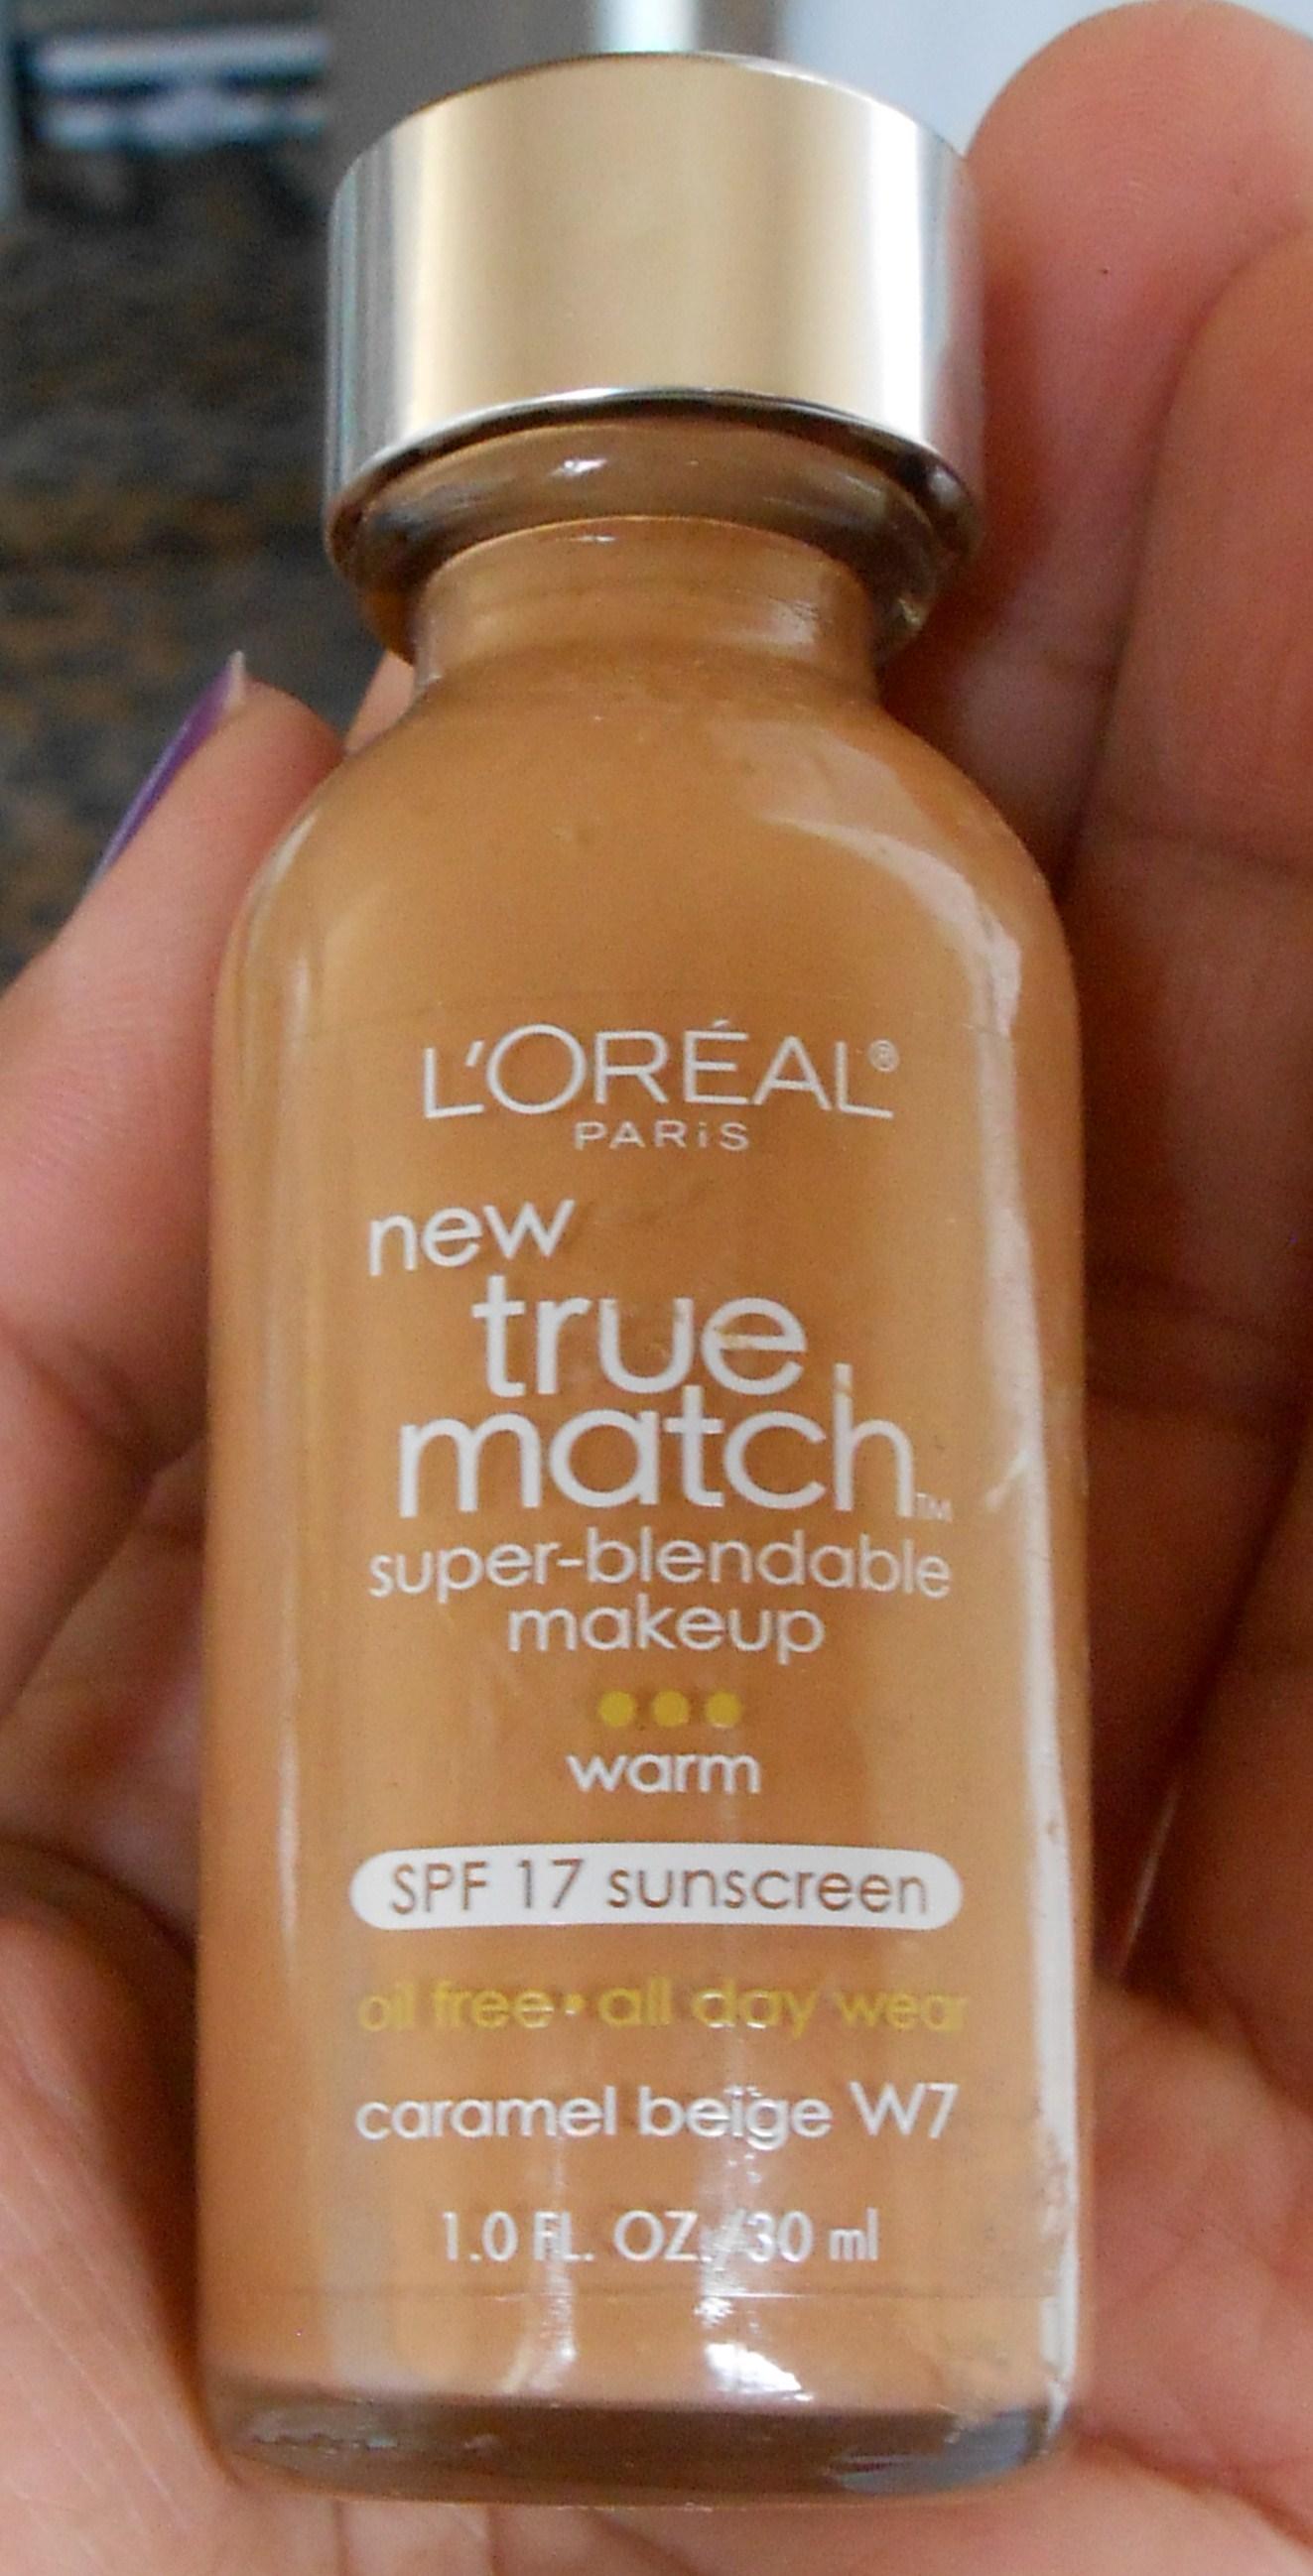 L Oreal True Match Coupons Cheddars Coupon Loreal Perfecting Powder Paris Super Blendable Compact Makeup